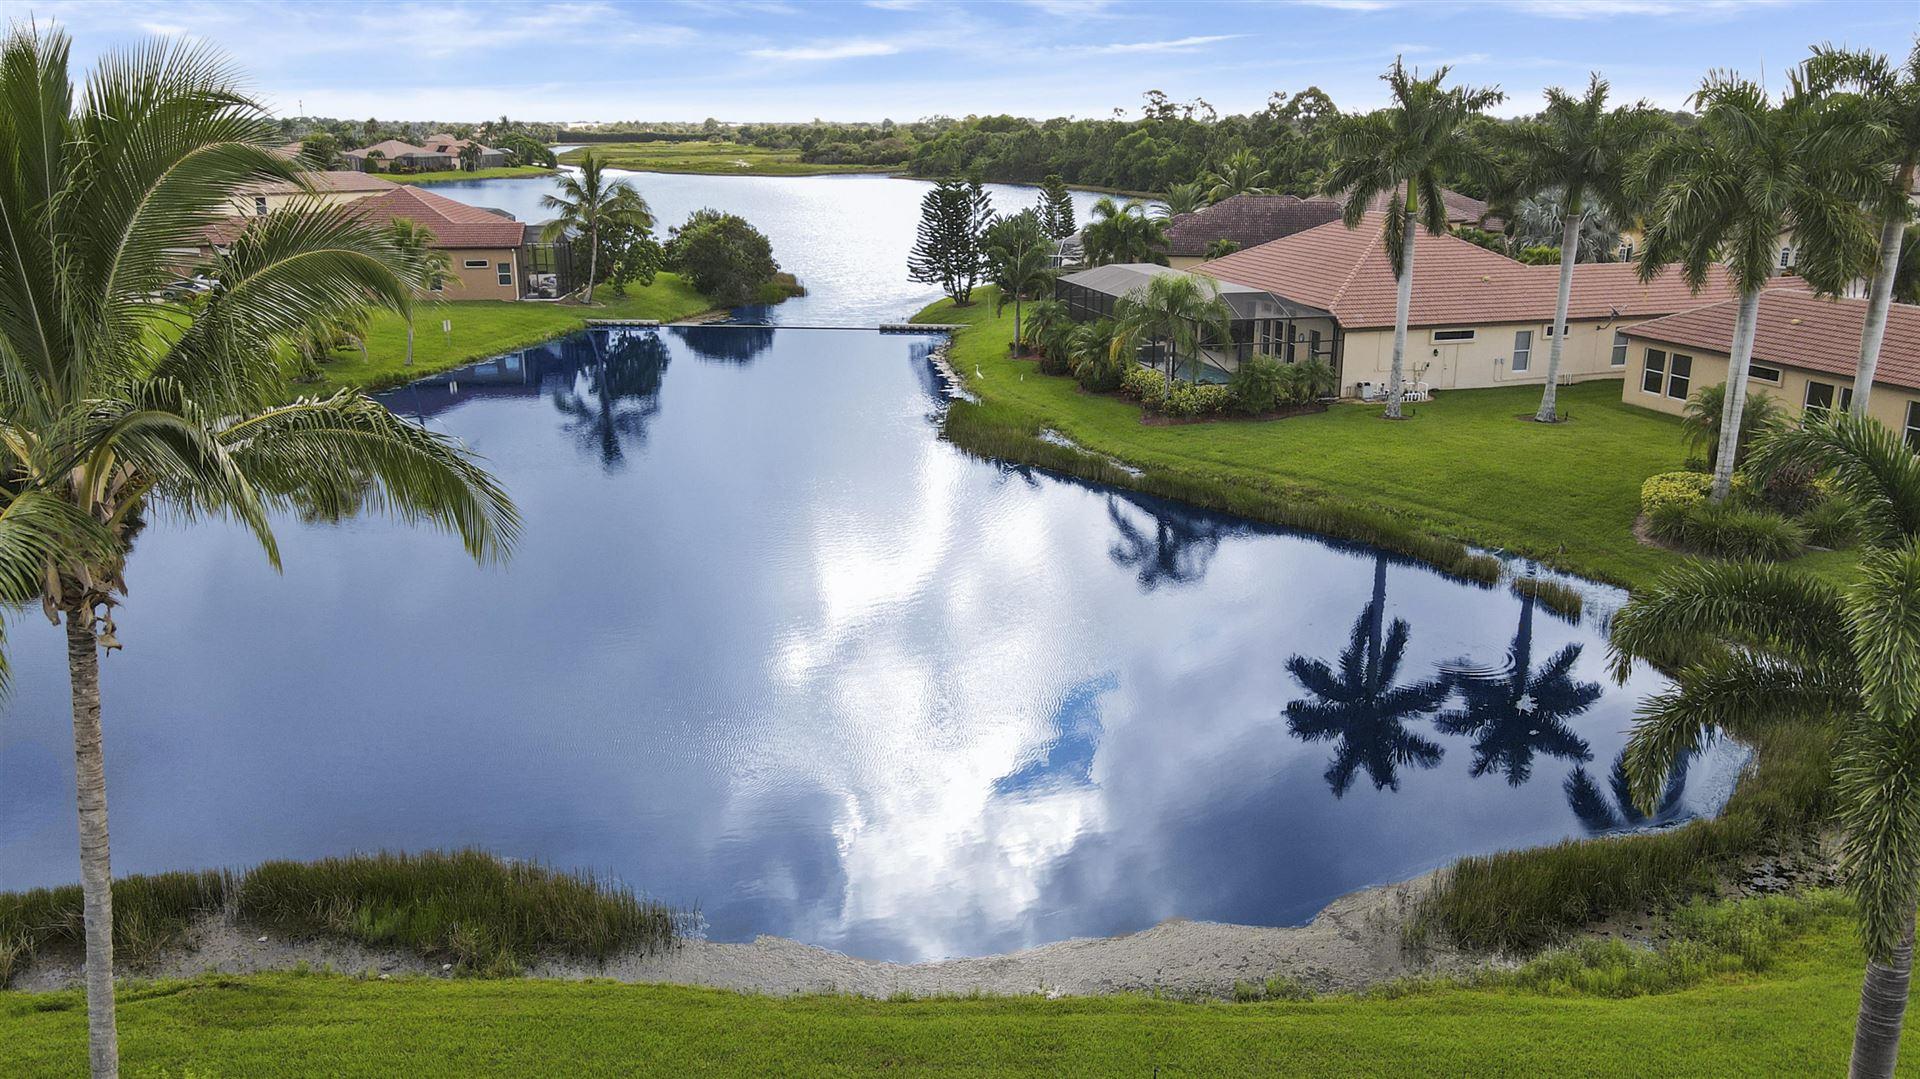 Photo of 853 SW Grand Reserve Boulevard, Port Saint Lucie, FL 34986 (MLS # RX-10654600)